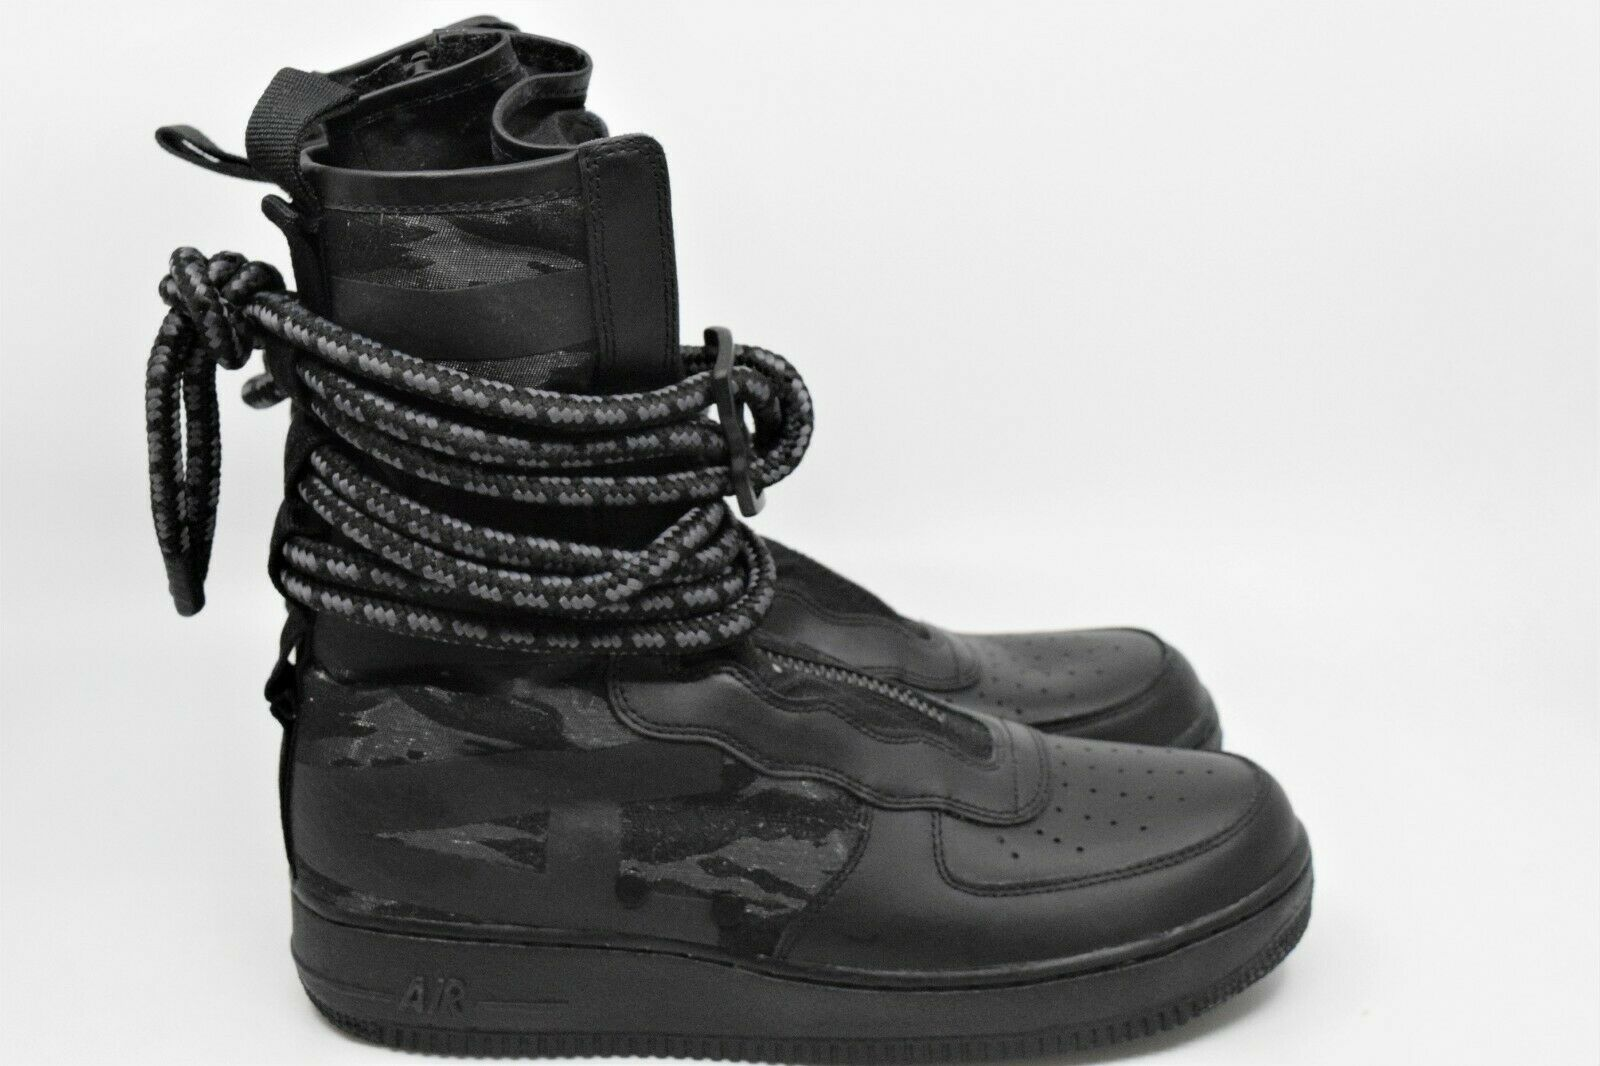 Nike SF Air Force 1 High BOOTS Black Dark Grey Size 10 Aa1128 002